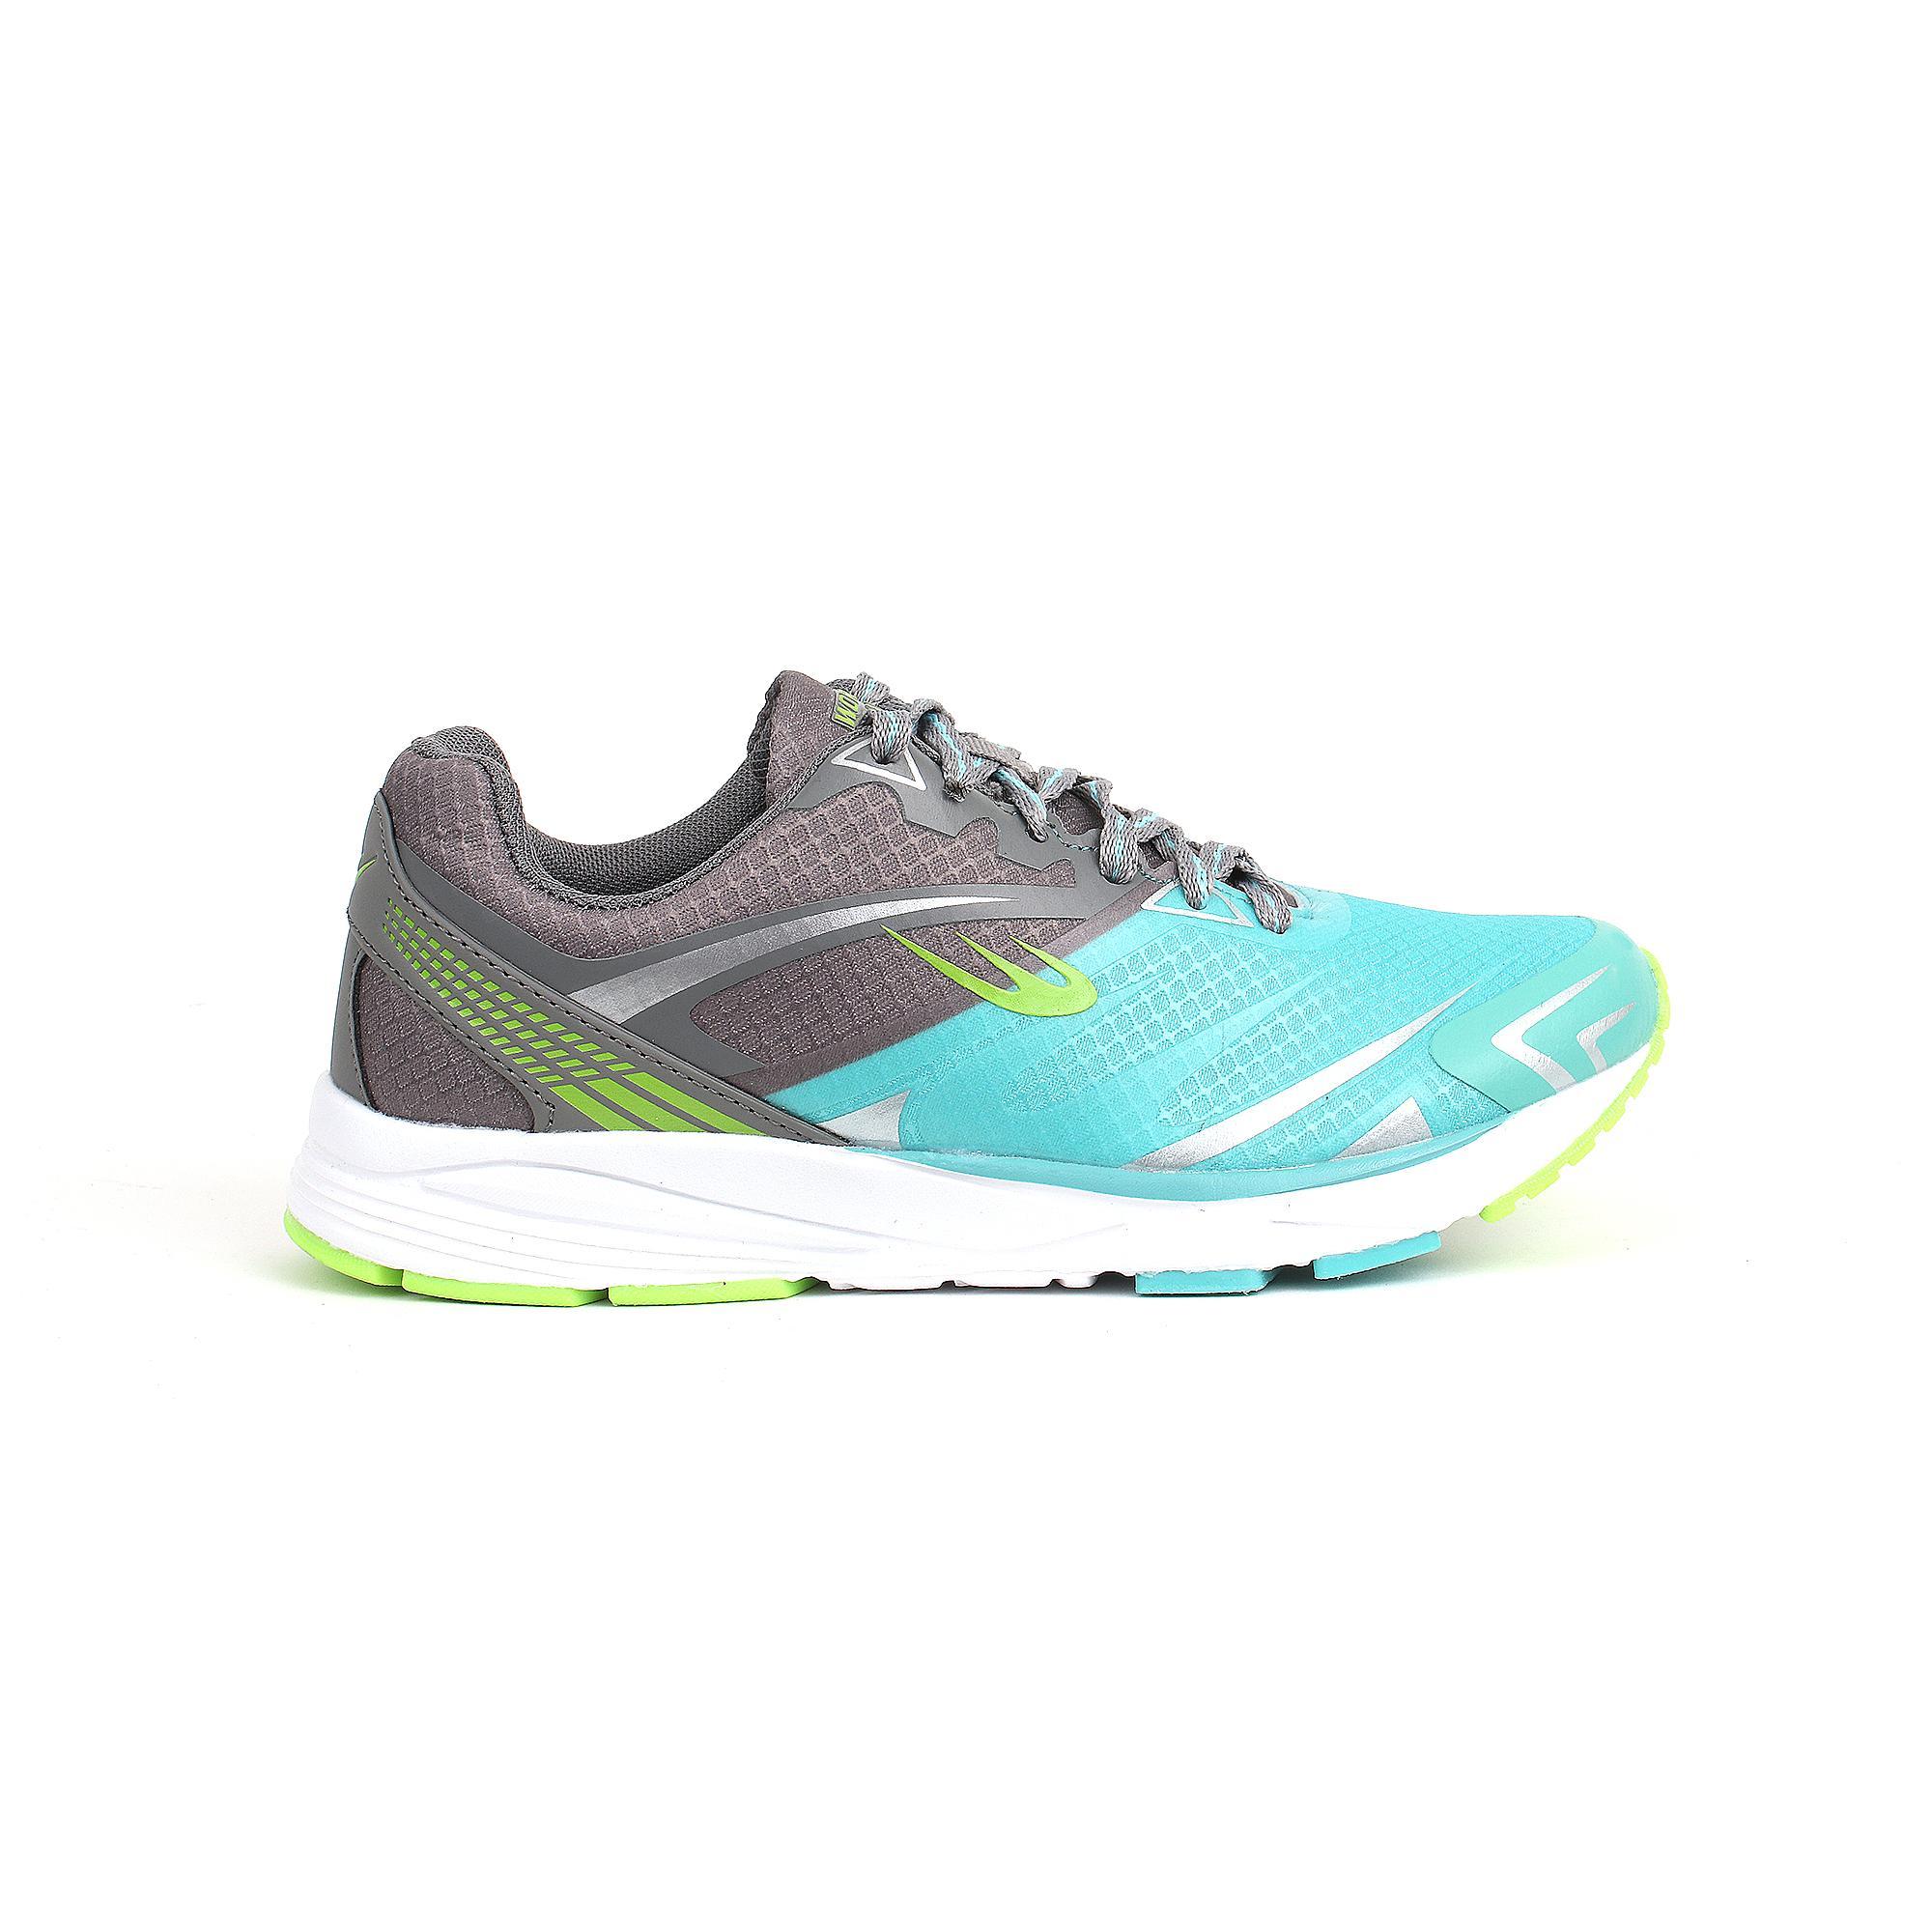 World Balance Philippines - World Balance Running Shoes for Women ... 688ba6503